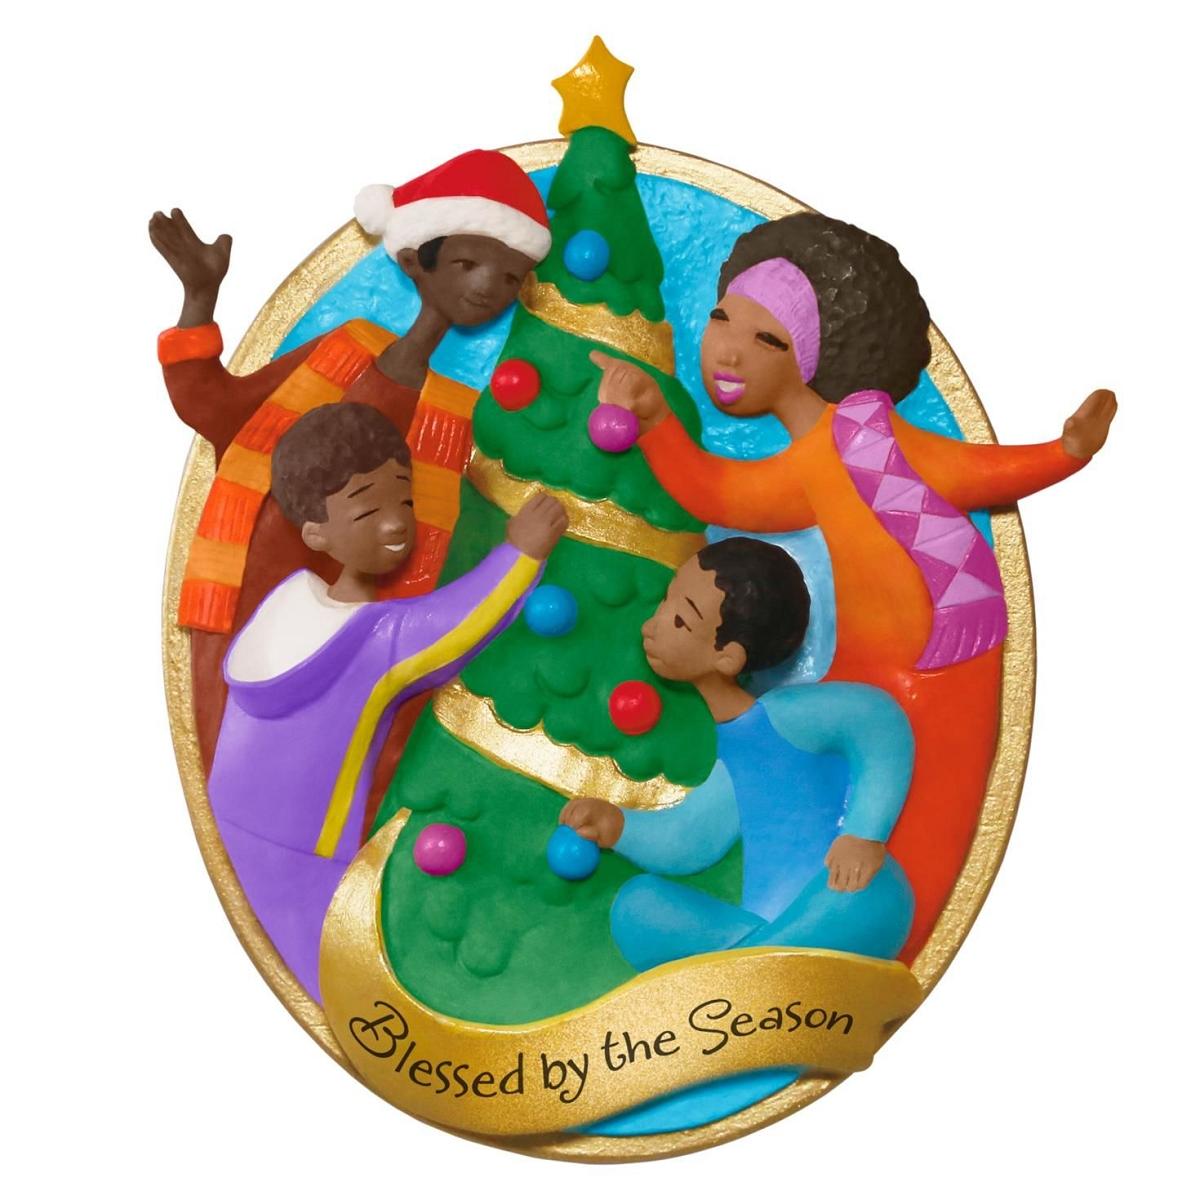 2016 blessed by the season hallmark keepsake ornament